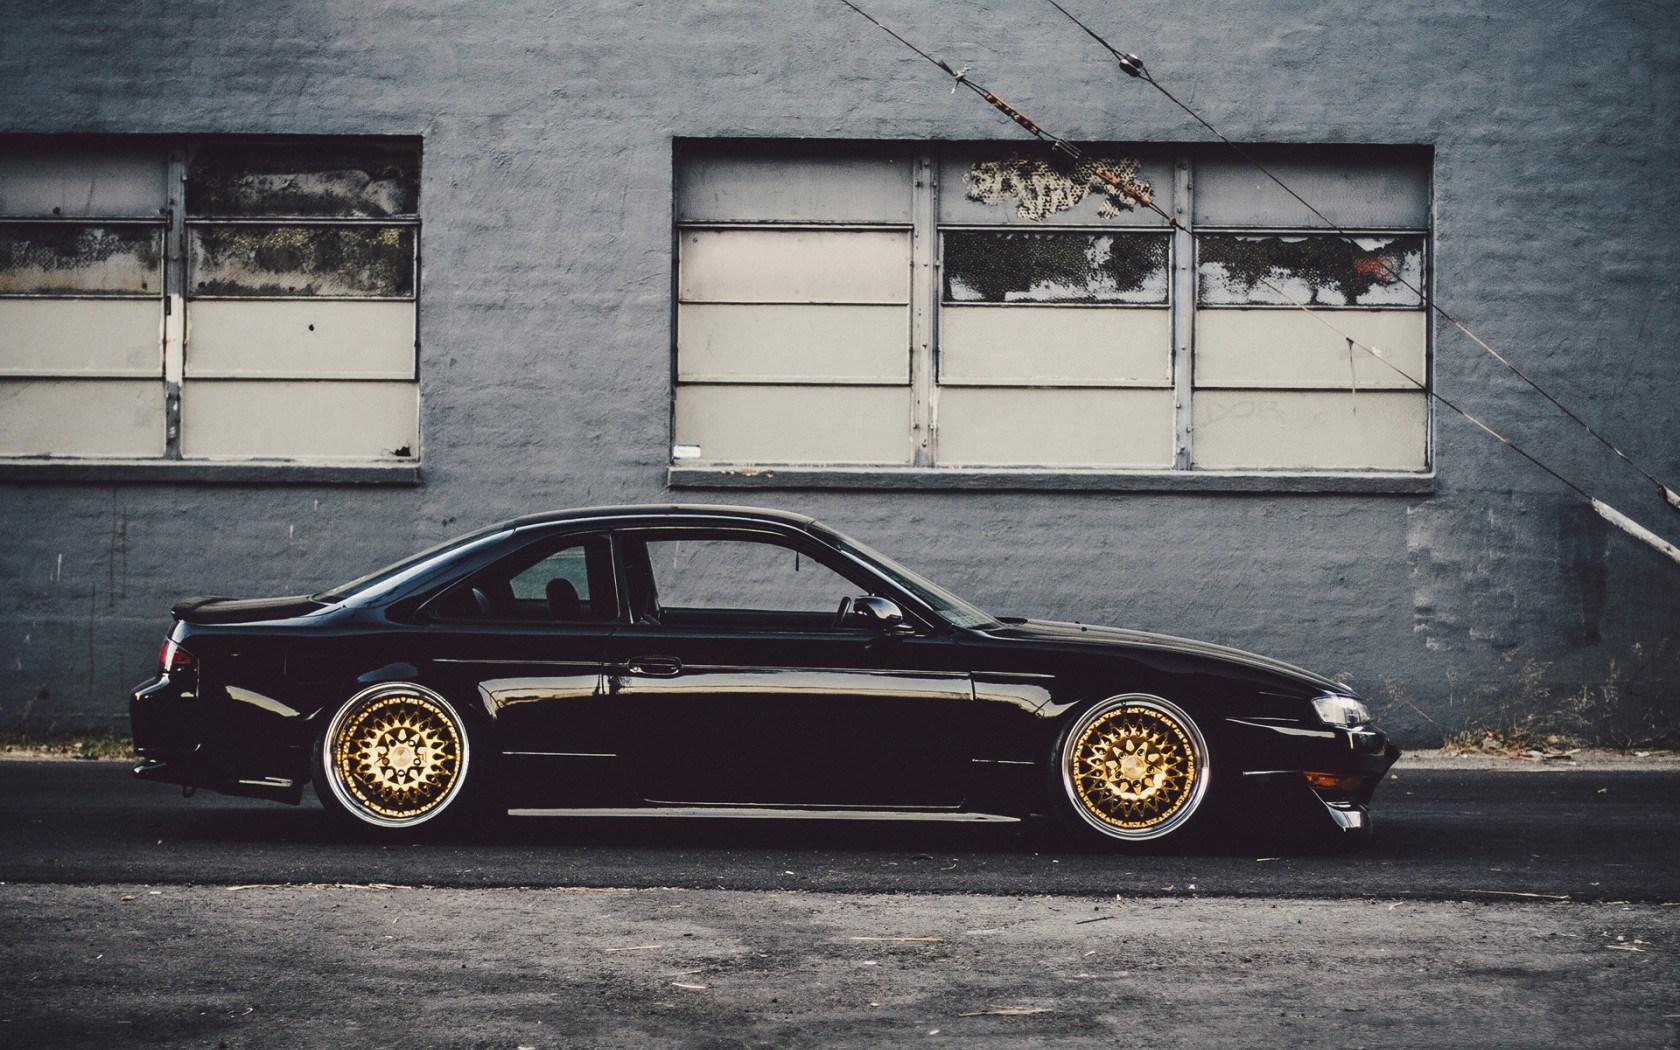 Nissan Silvia 240SX S14 Car Tuning